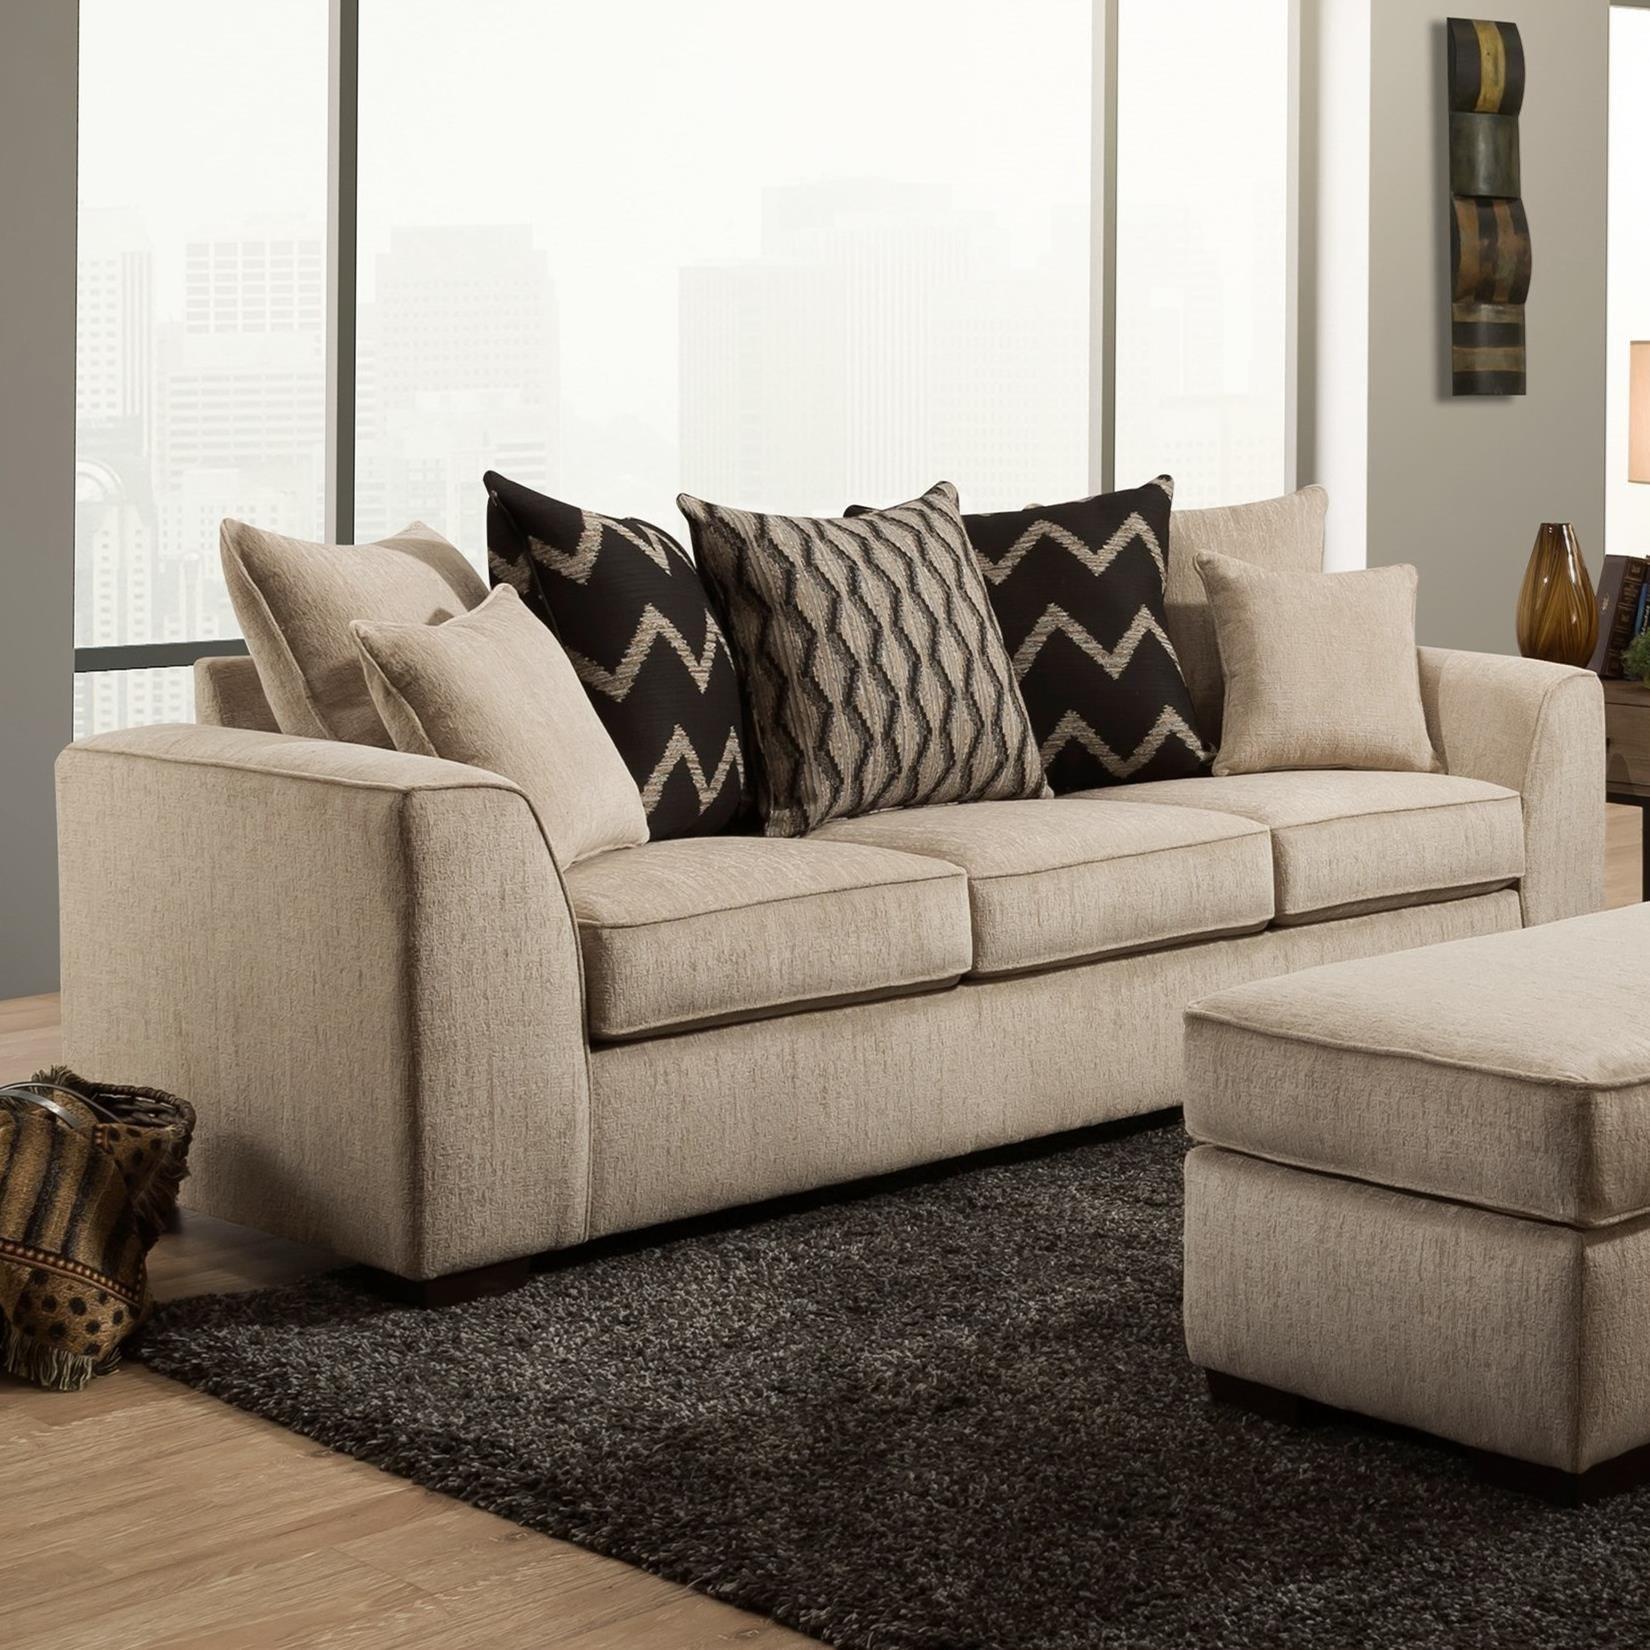 2600 Sofa by Peak Living at Prime Brothers Furniture